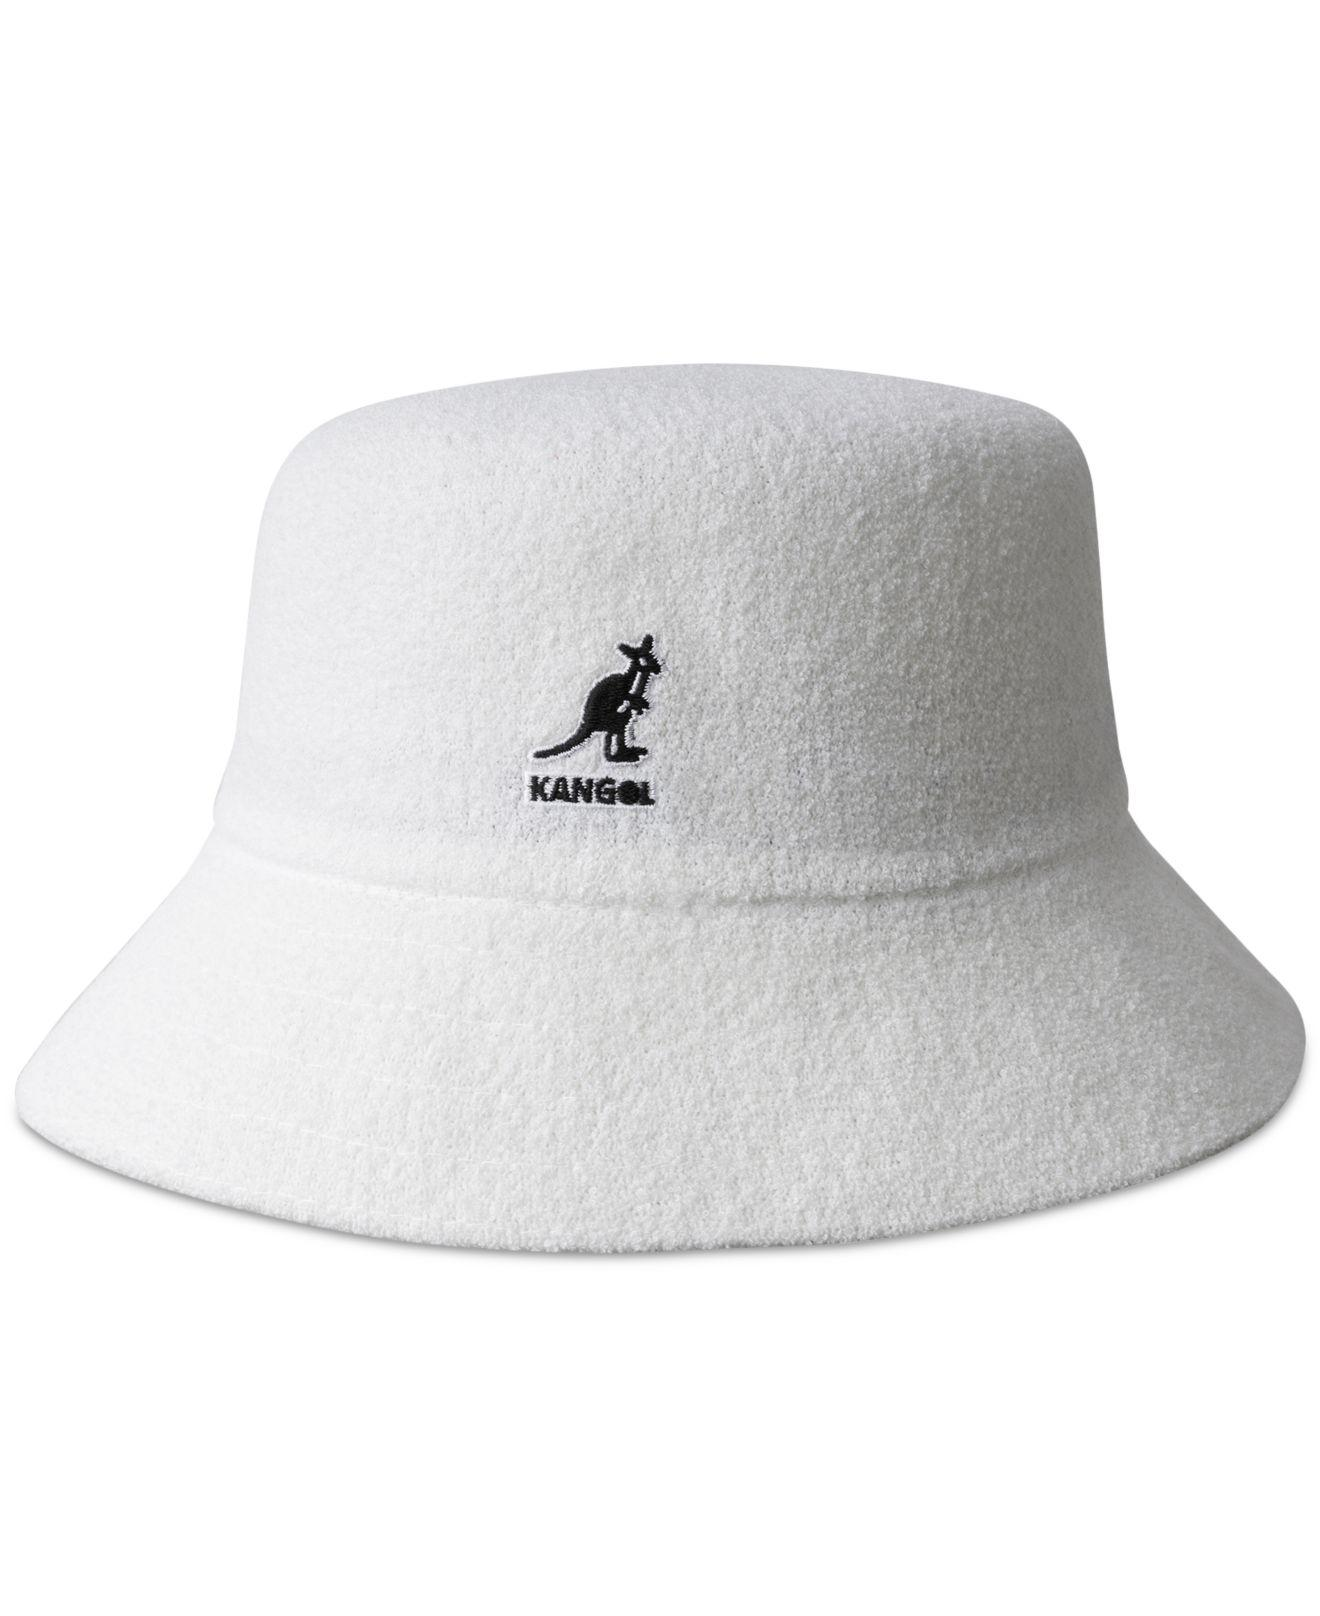 Lyst - Kangol Bermuda Terry Bouclé Bucket Hat in White for Men 84d990bdf6b